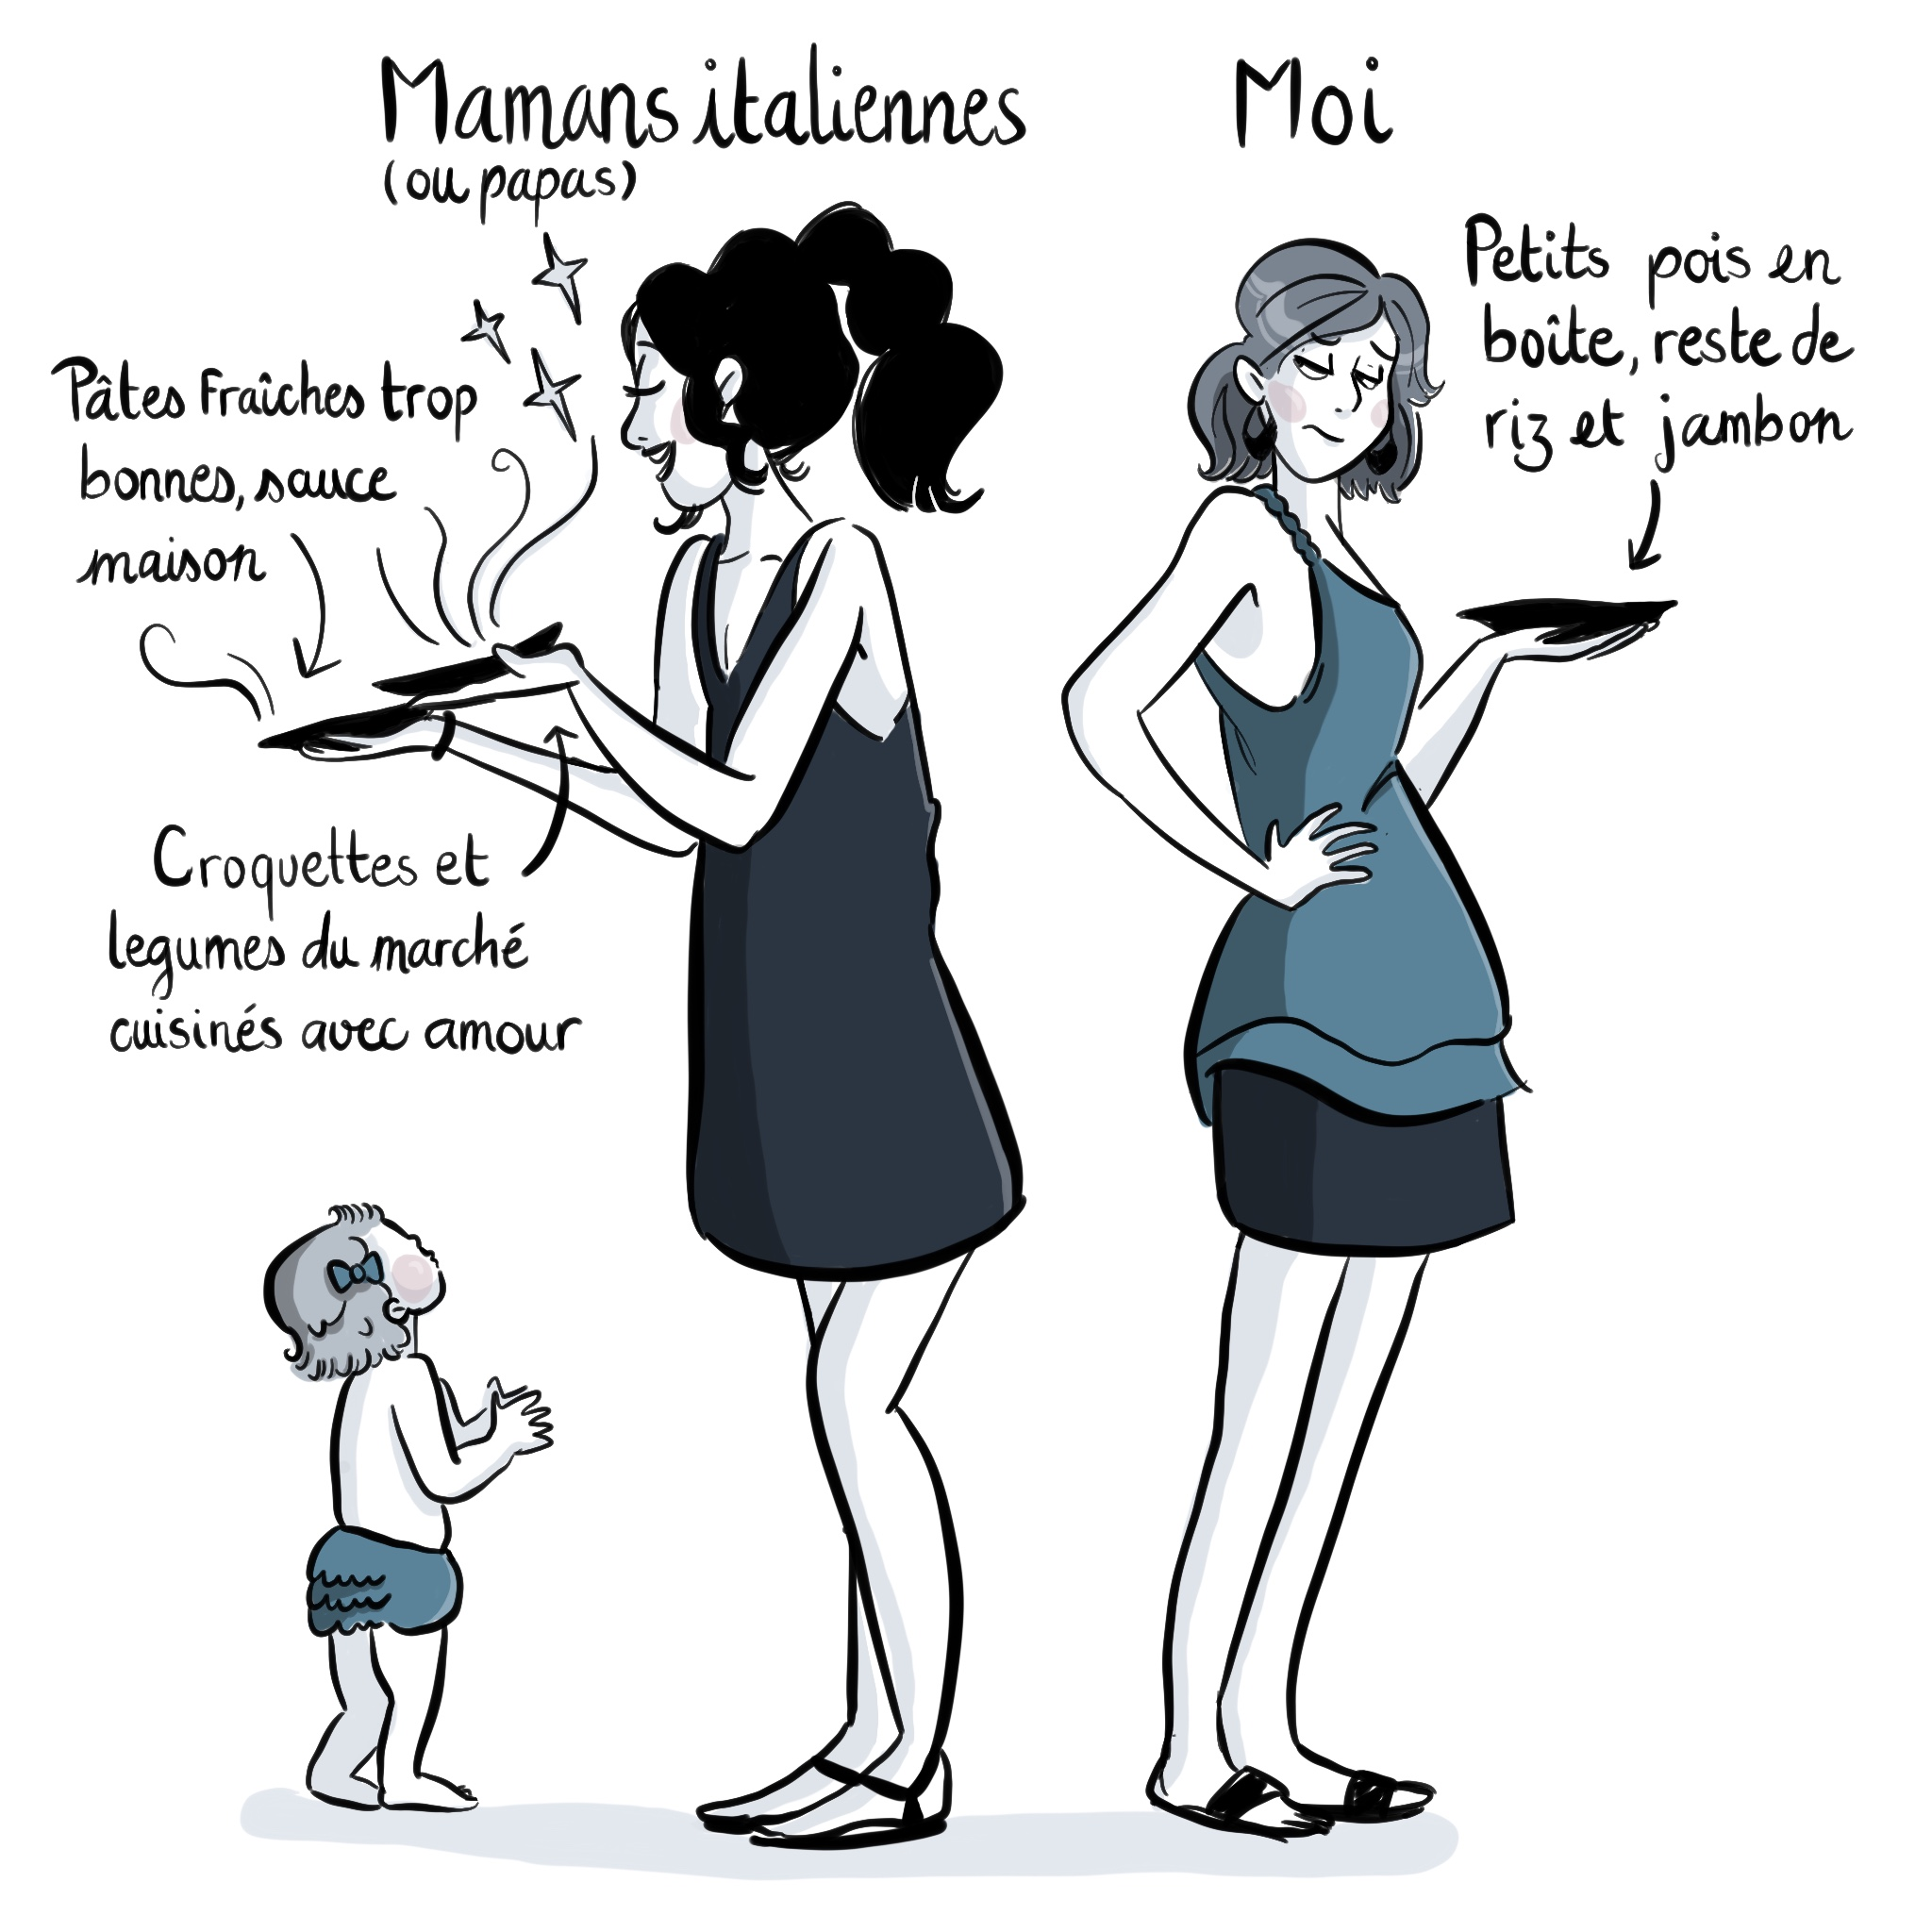 Les bons petits plats des mamans italiennes